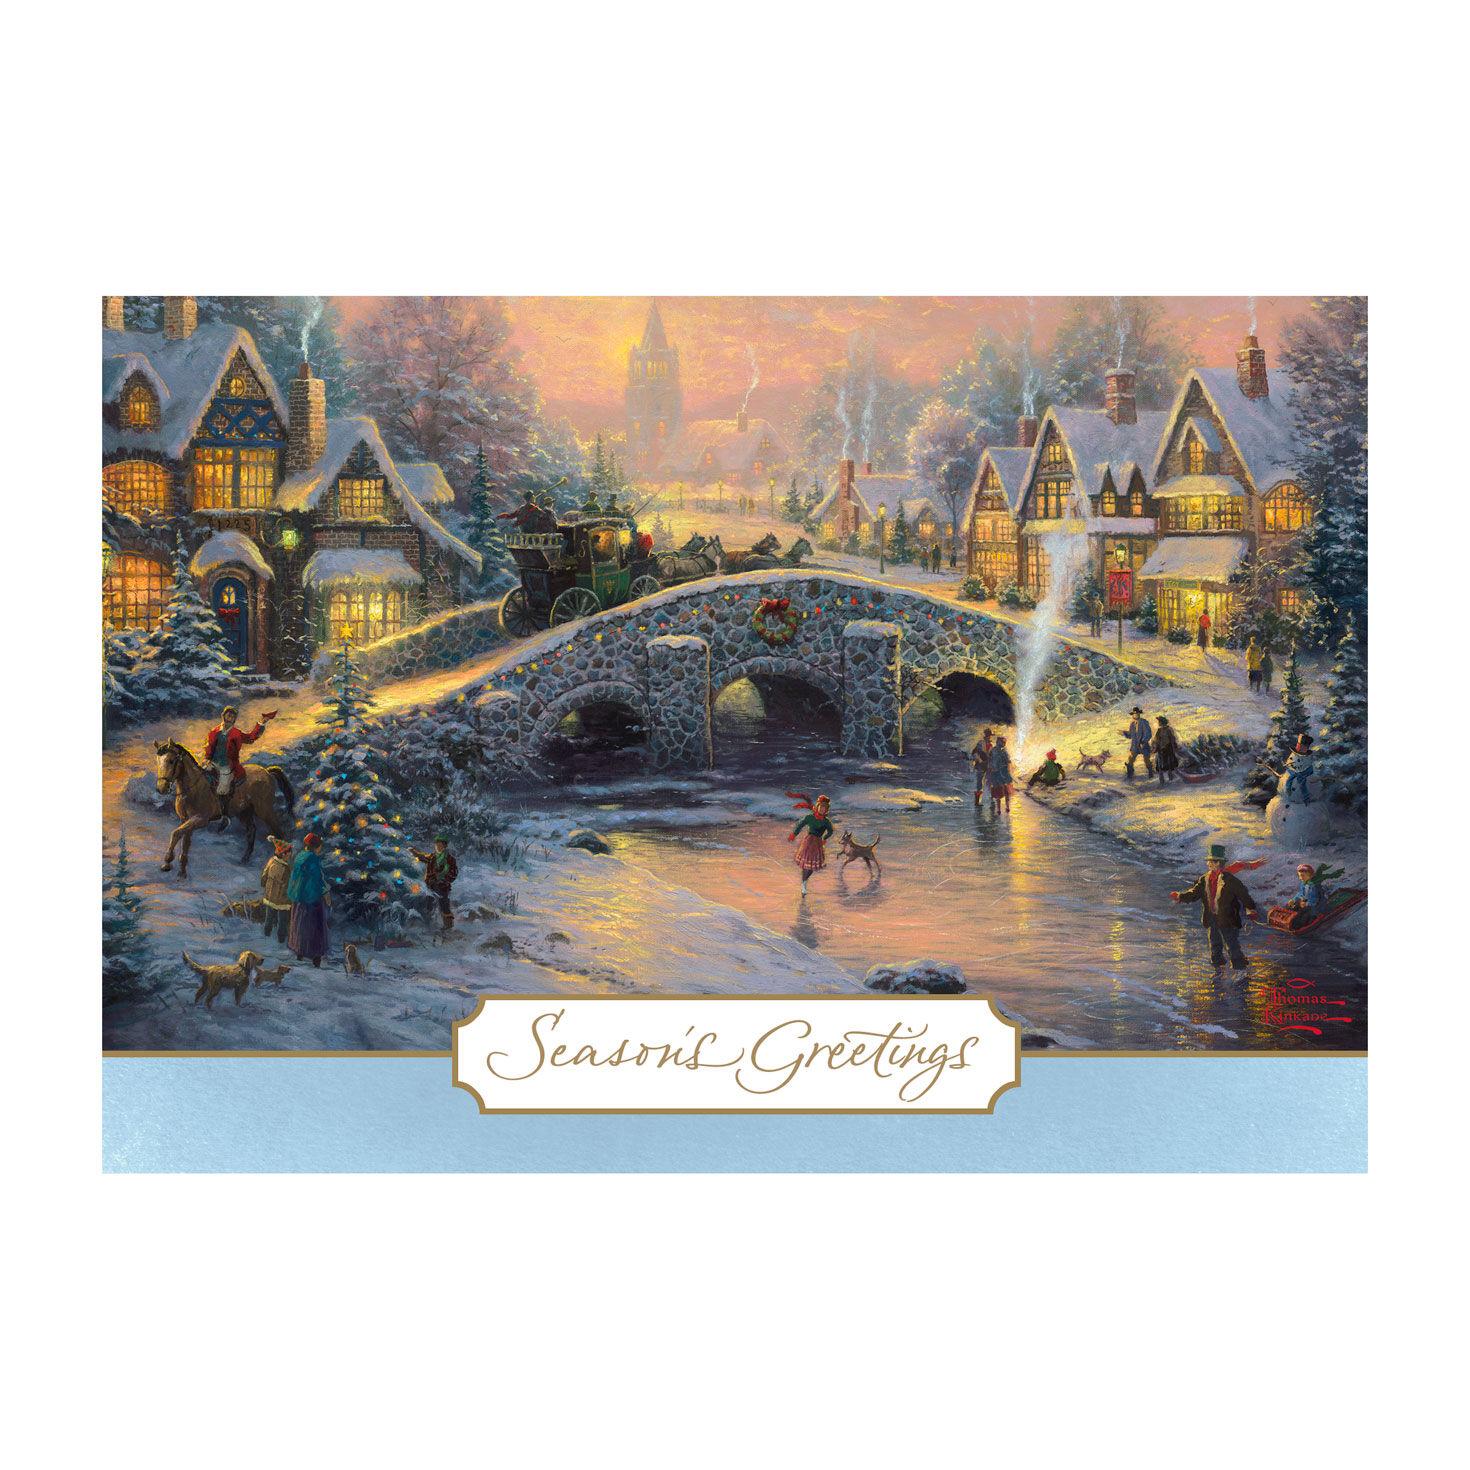 Thomas Kinkade Spirit Of Christmas Holiday Cards